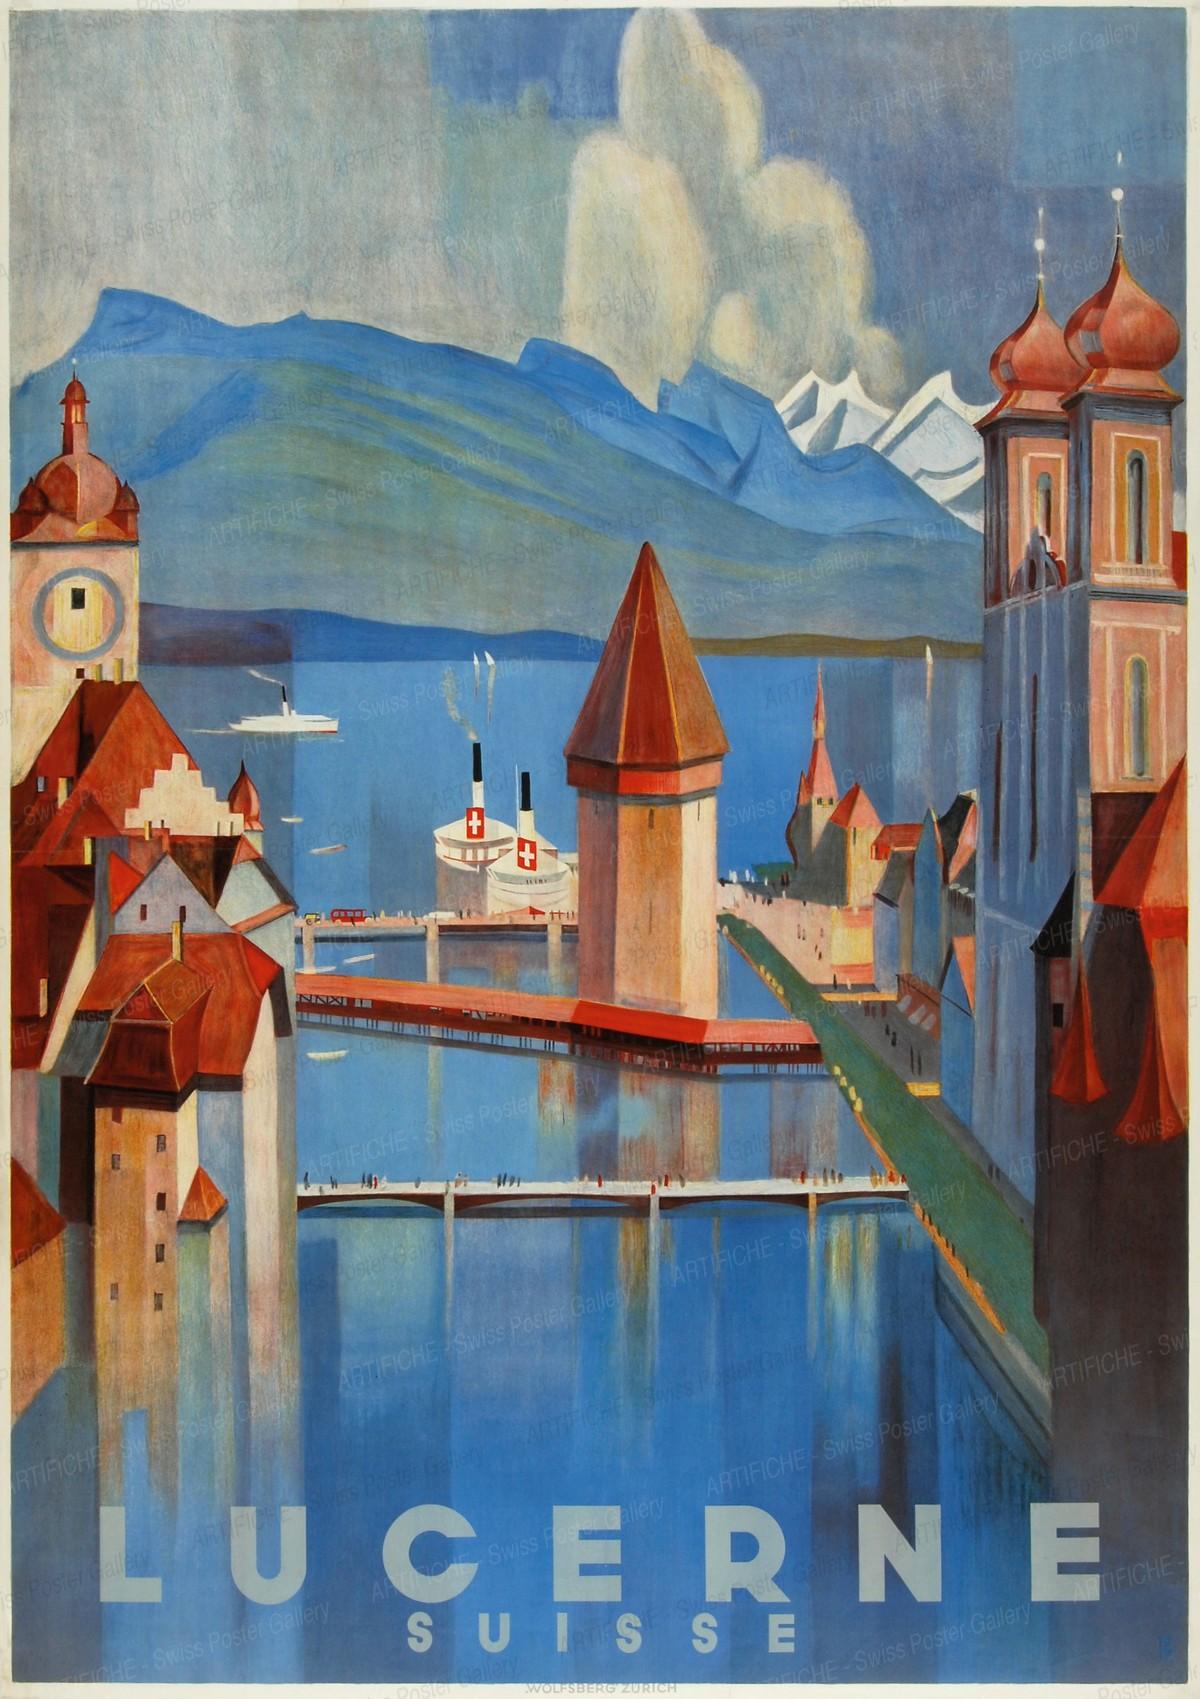 LUCERNE SUISSE, Otto Baumberger